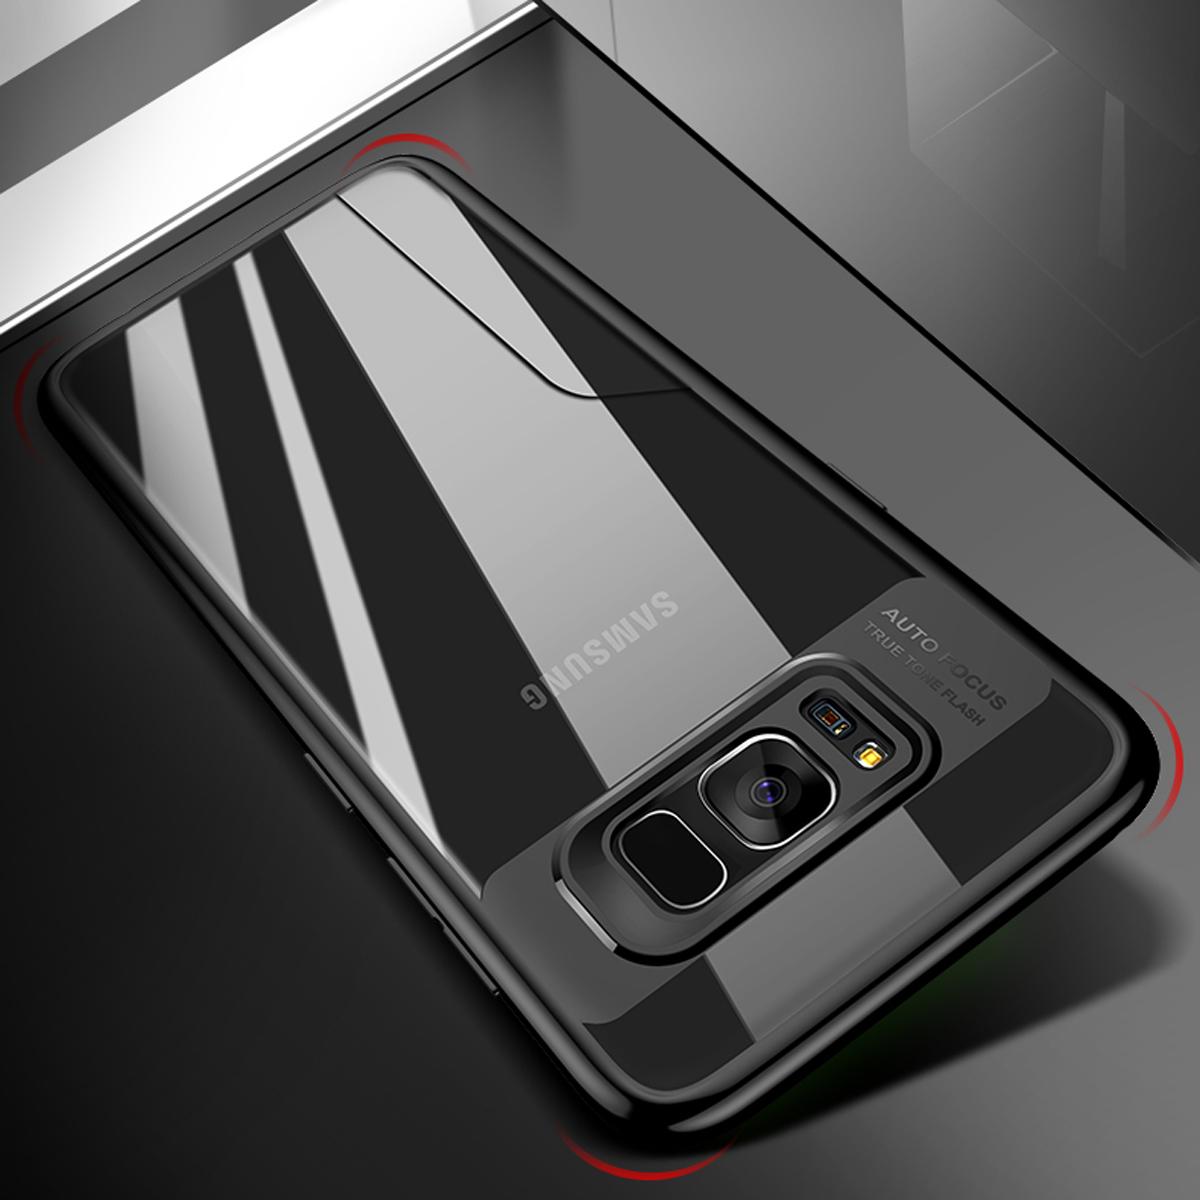 best website 5d457 9606a Samsung Galaxy J2 J5 J7 Prime A5 A7 2017 Transparent Case Cover Casing